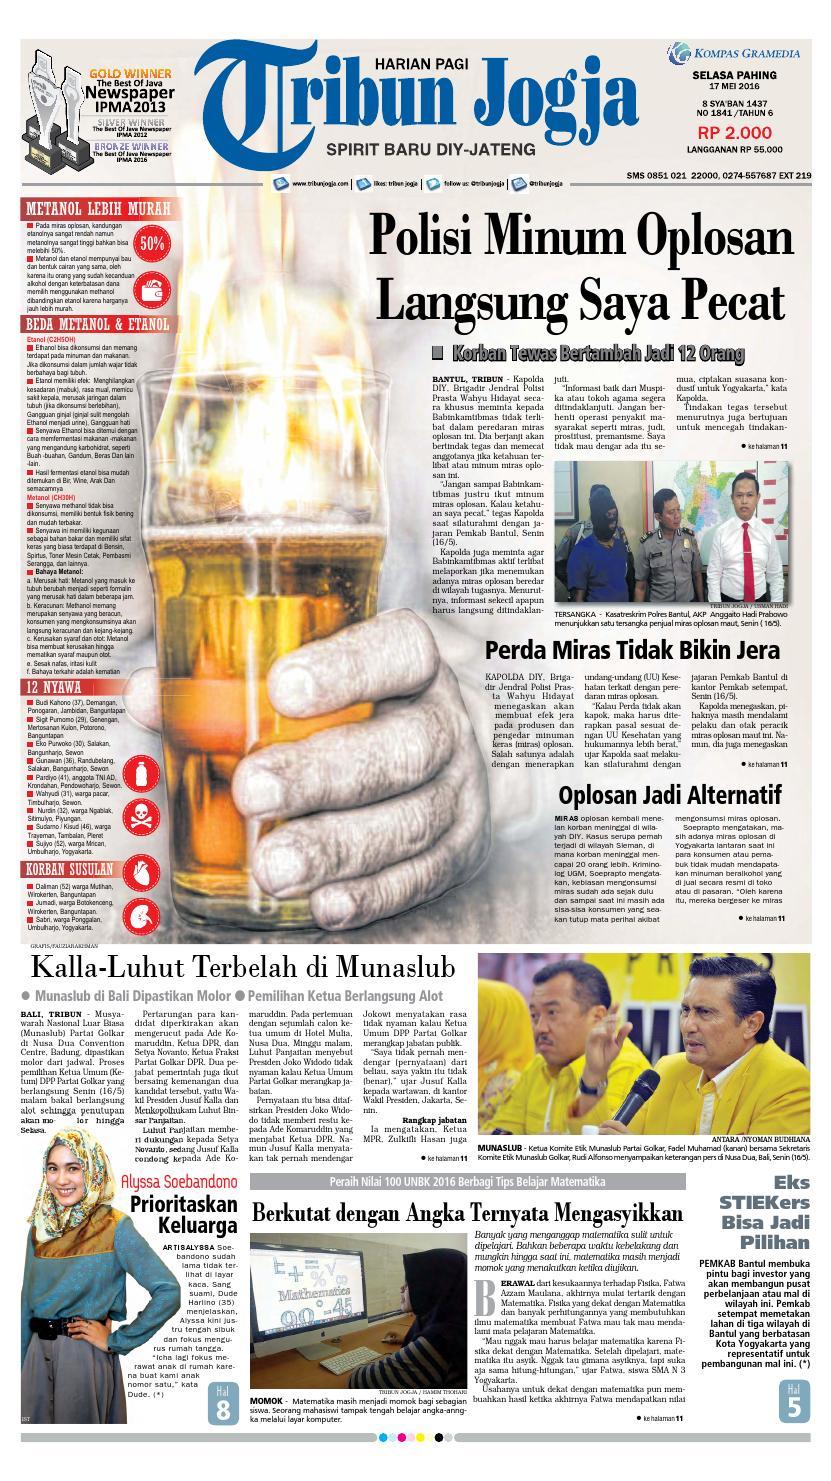 Tribunjogja 17 05 2016 By Tribun Jogja Issuu Sambal Cowek 27 Neng Uud Kitchen